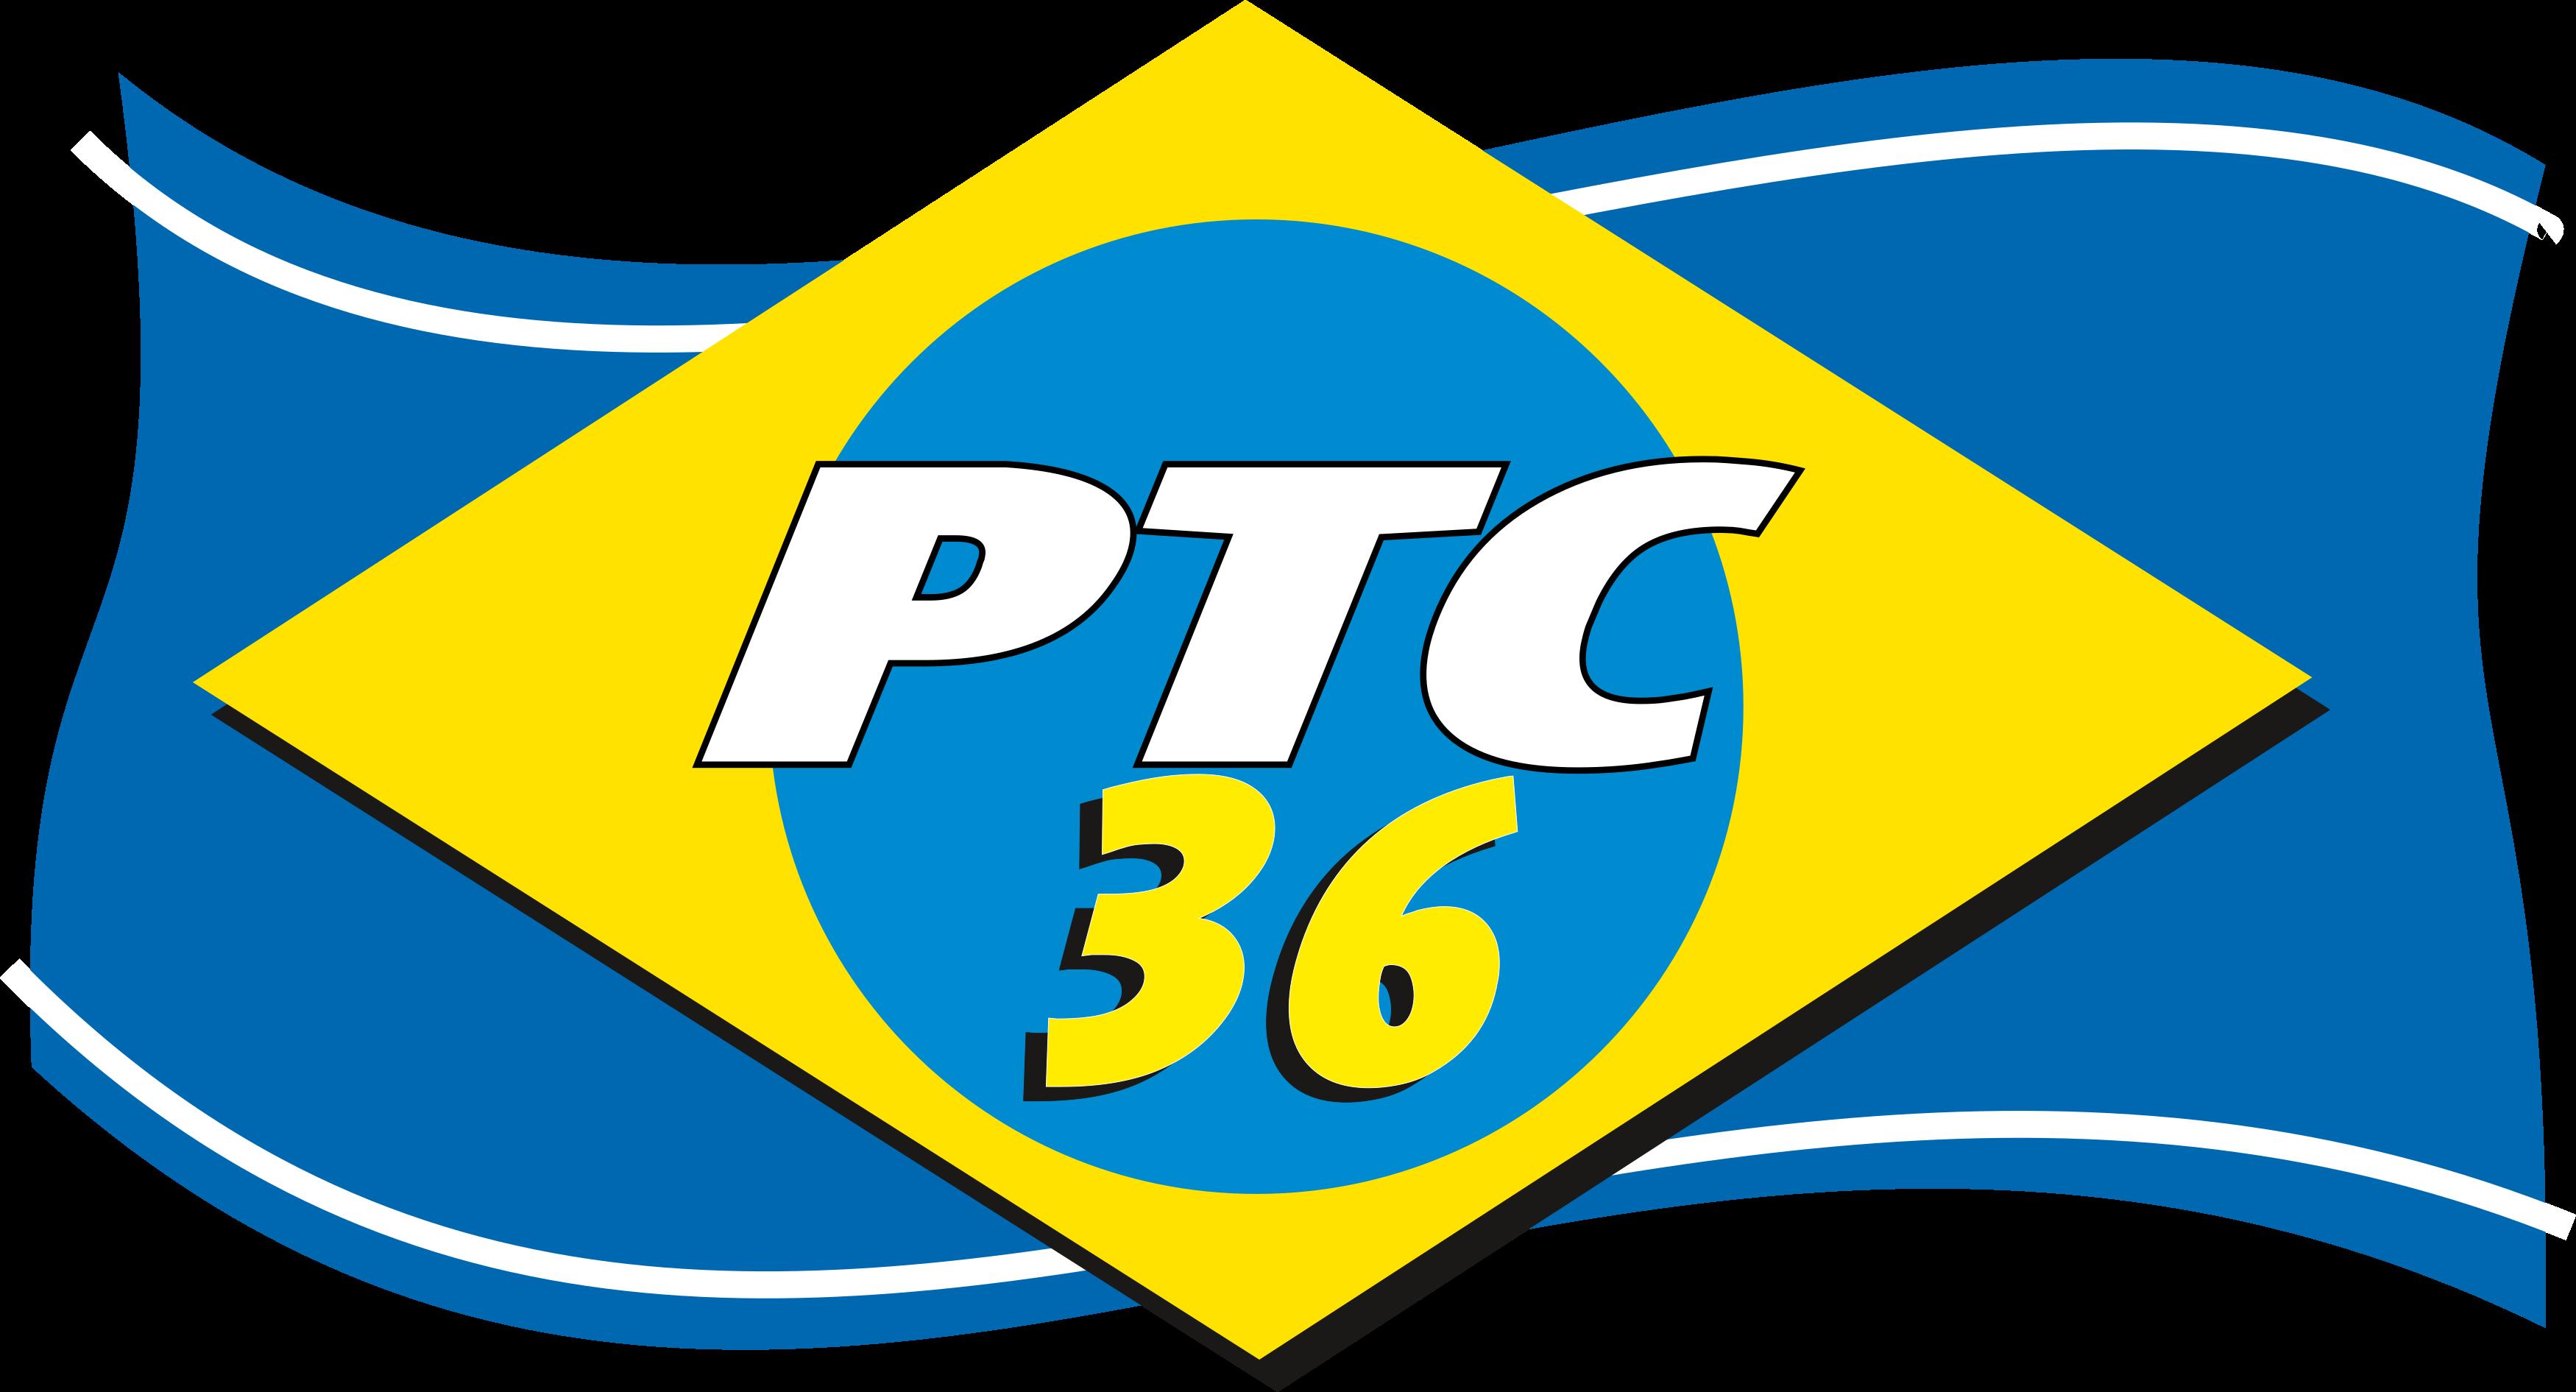 HD Ptc Png.